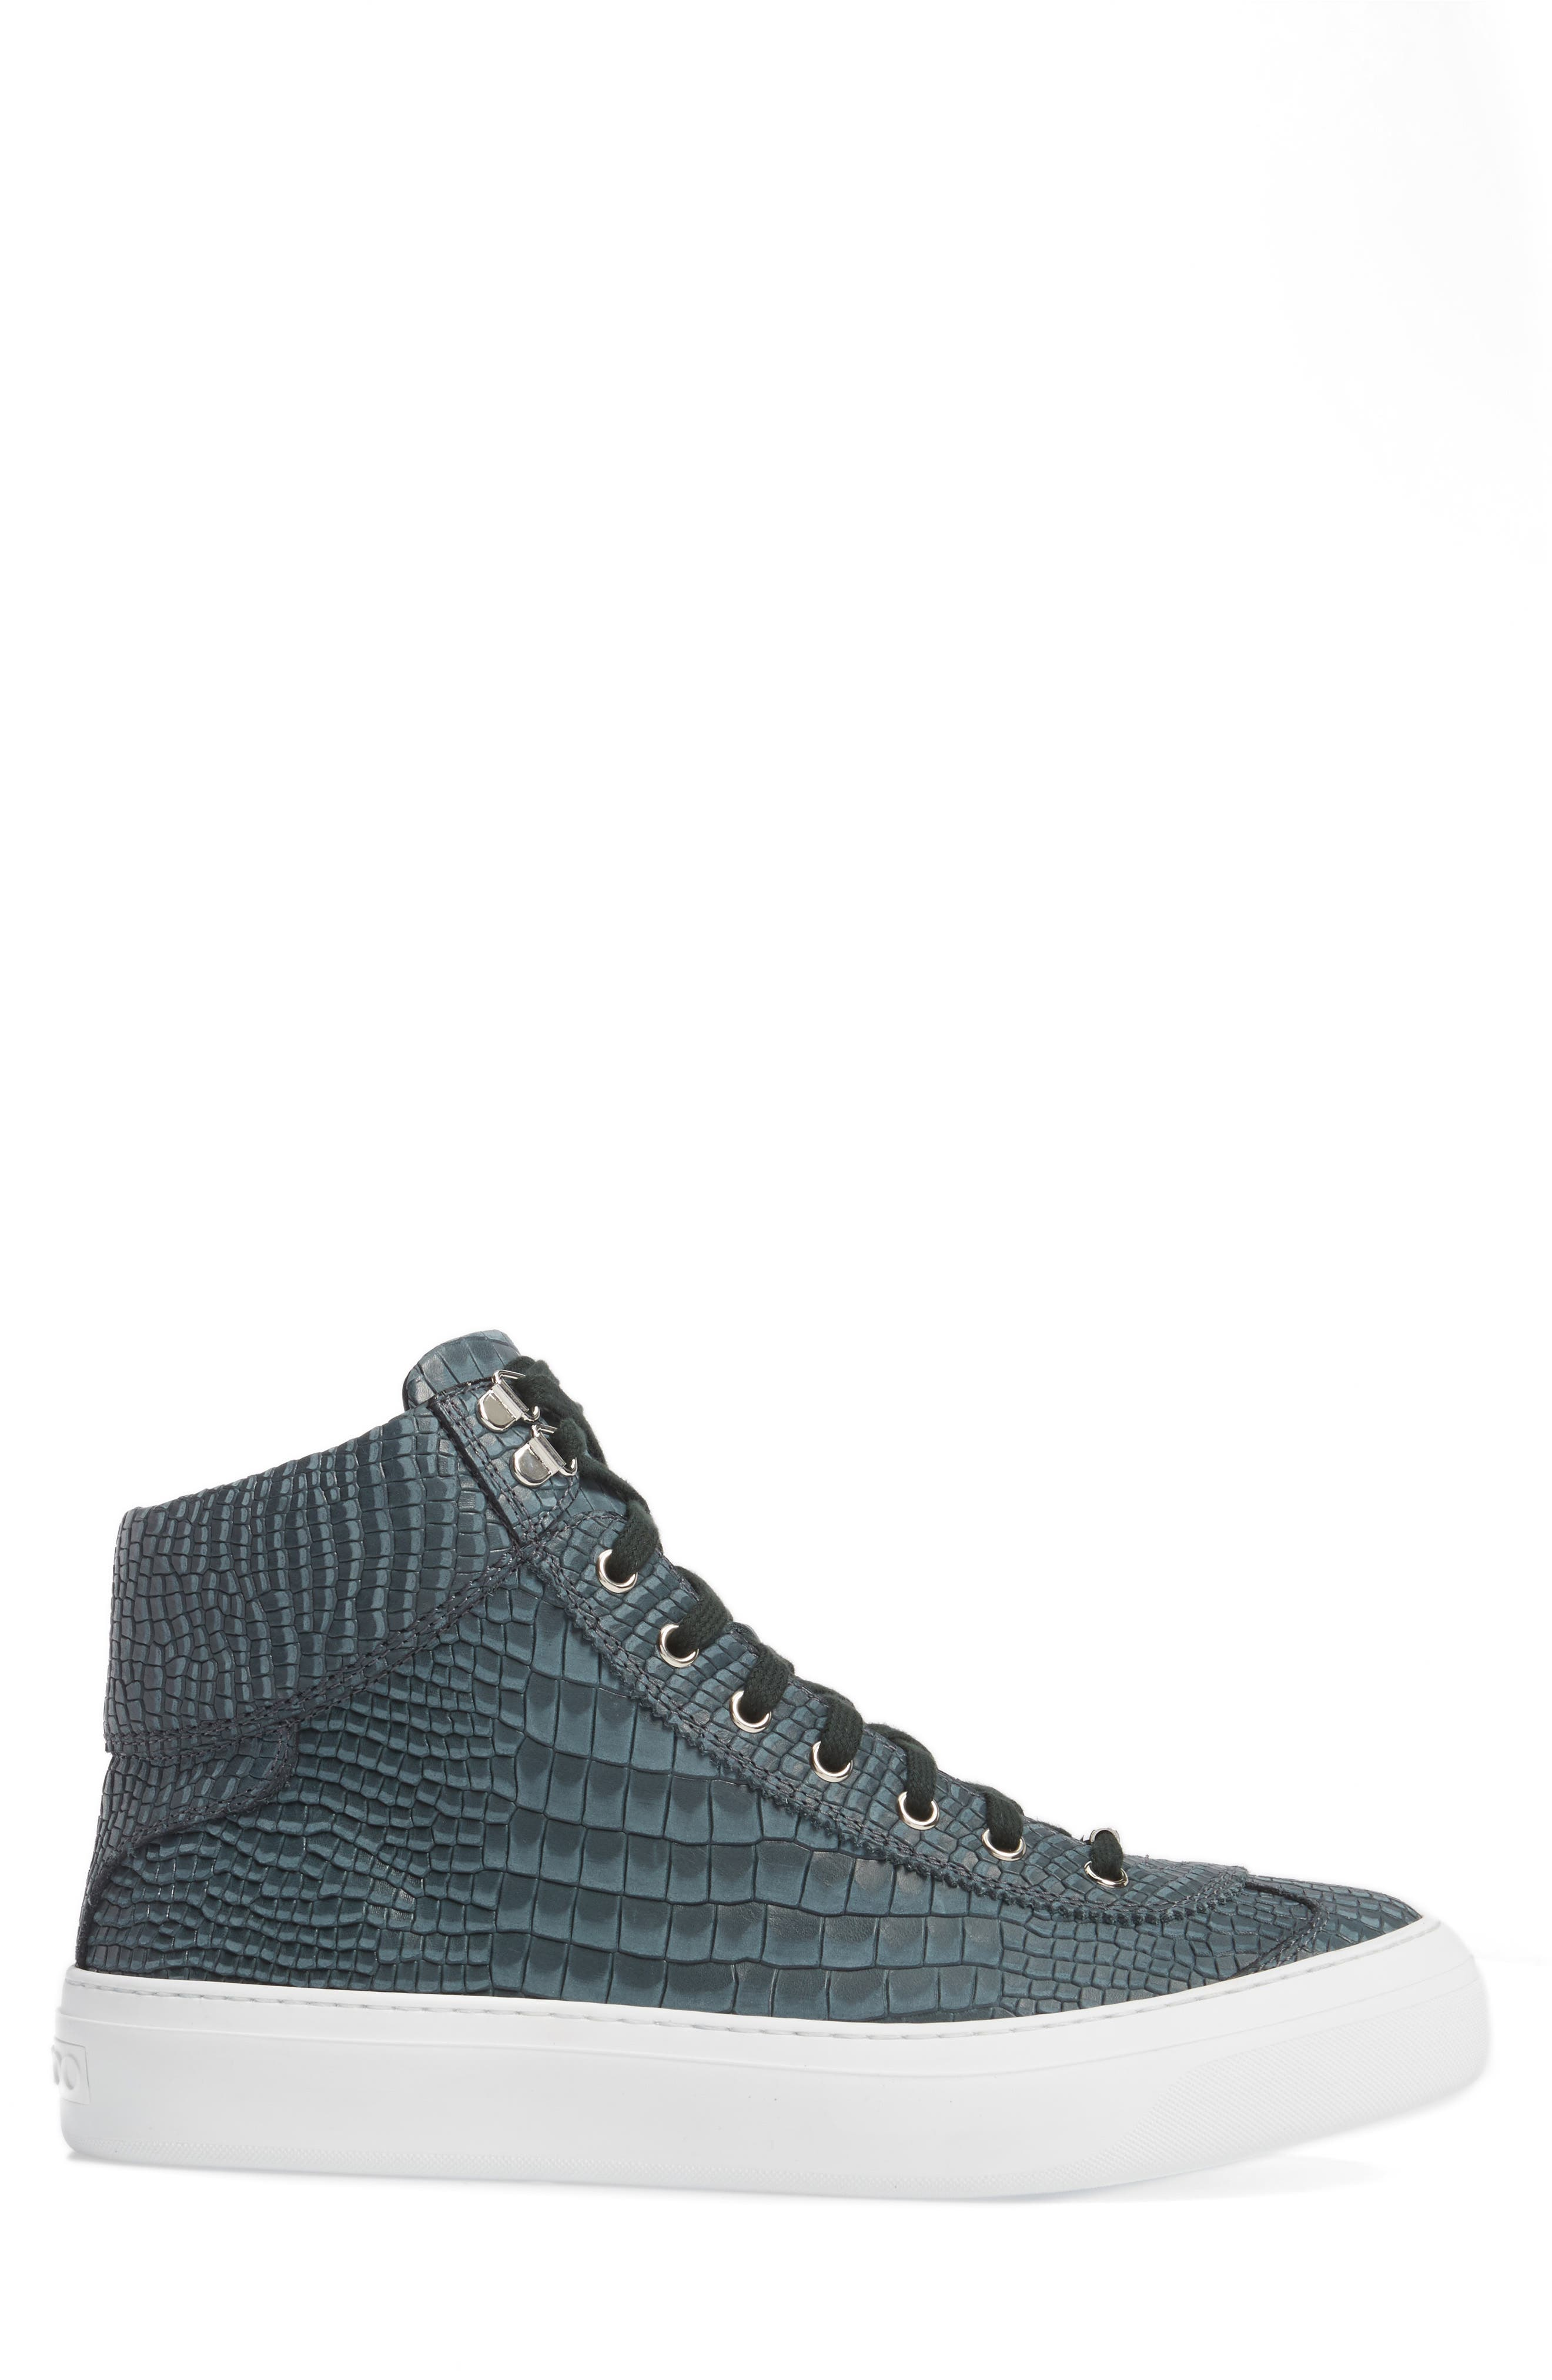 Argyle Sneaker,                             Alternate thumbnail 3, color,                             301